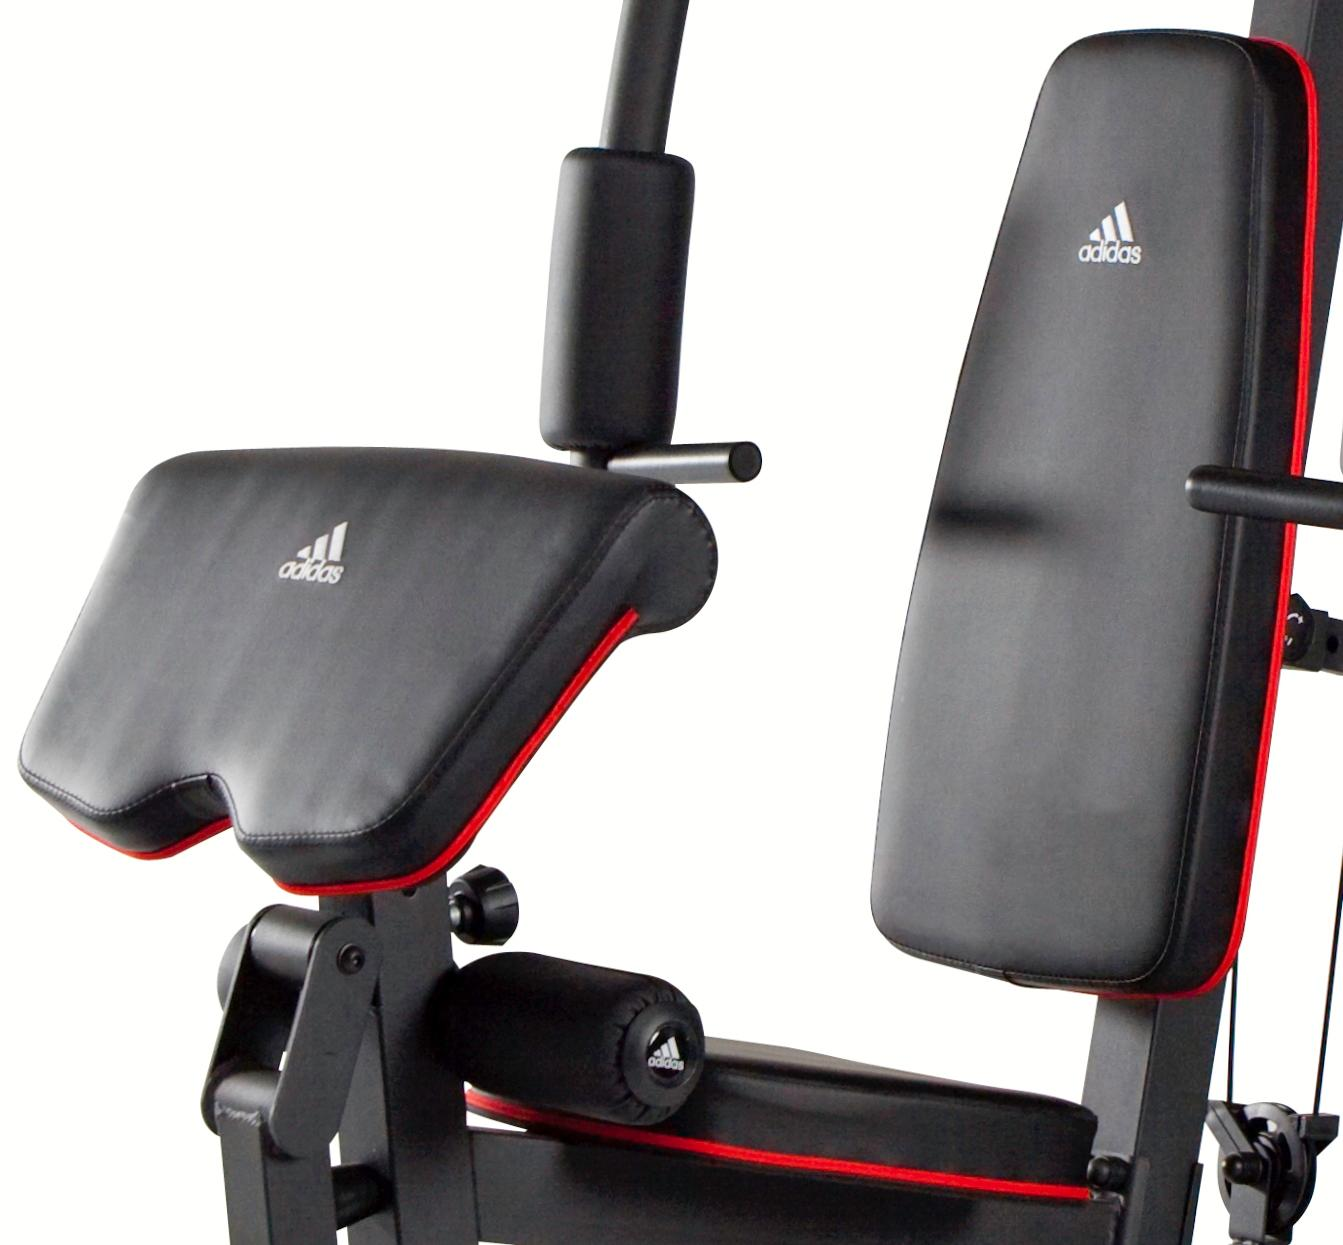 Amazon.com : adidas 200 pound stack home gym : sports & outdoors